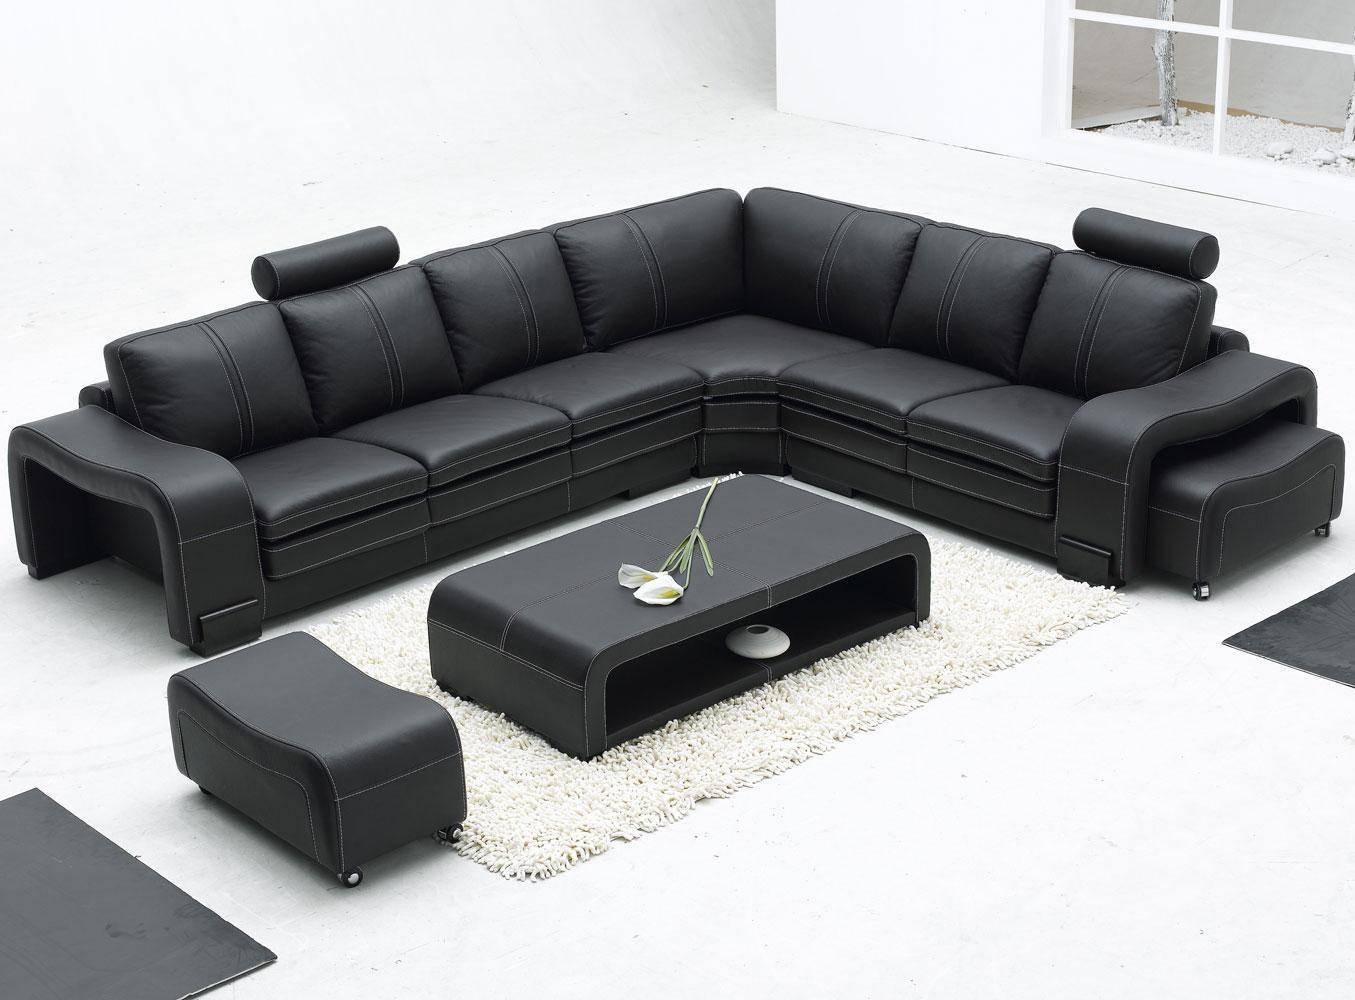 Contemporary Black Leather Sofa Photo – 14: Beautiful Pictures Of Pertaining To Contemporary Black Leather Sofas (View 9 of 30)